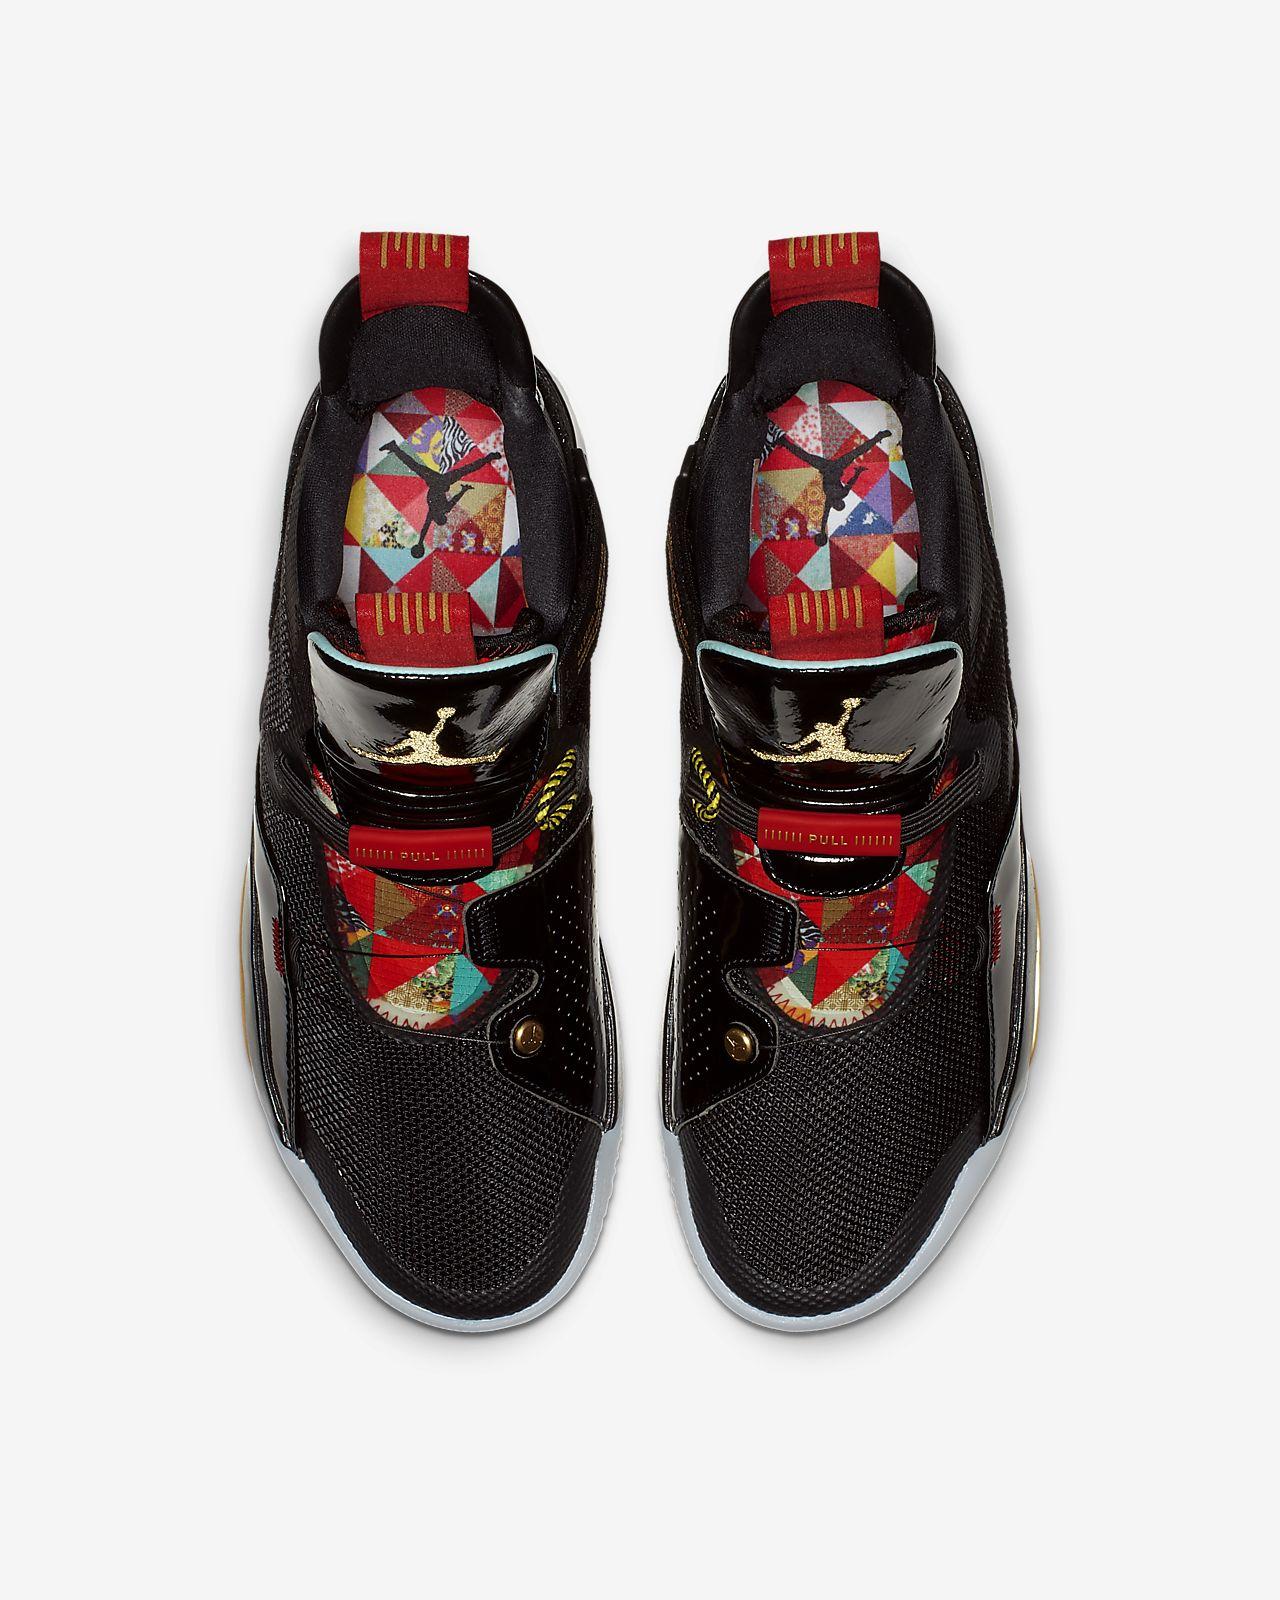 844dead1be749c Low Resolution Air Jordan XXXIII Basketball Shoe Air Jordan XXXIII  Basketball Shoe